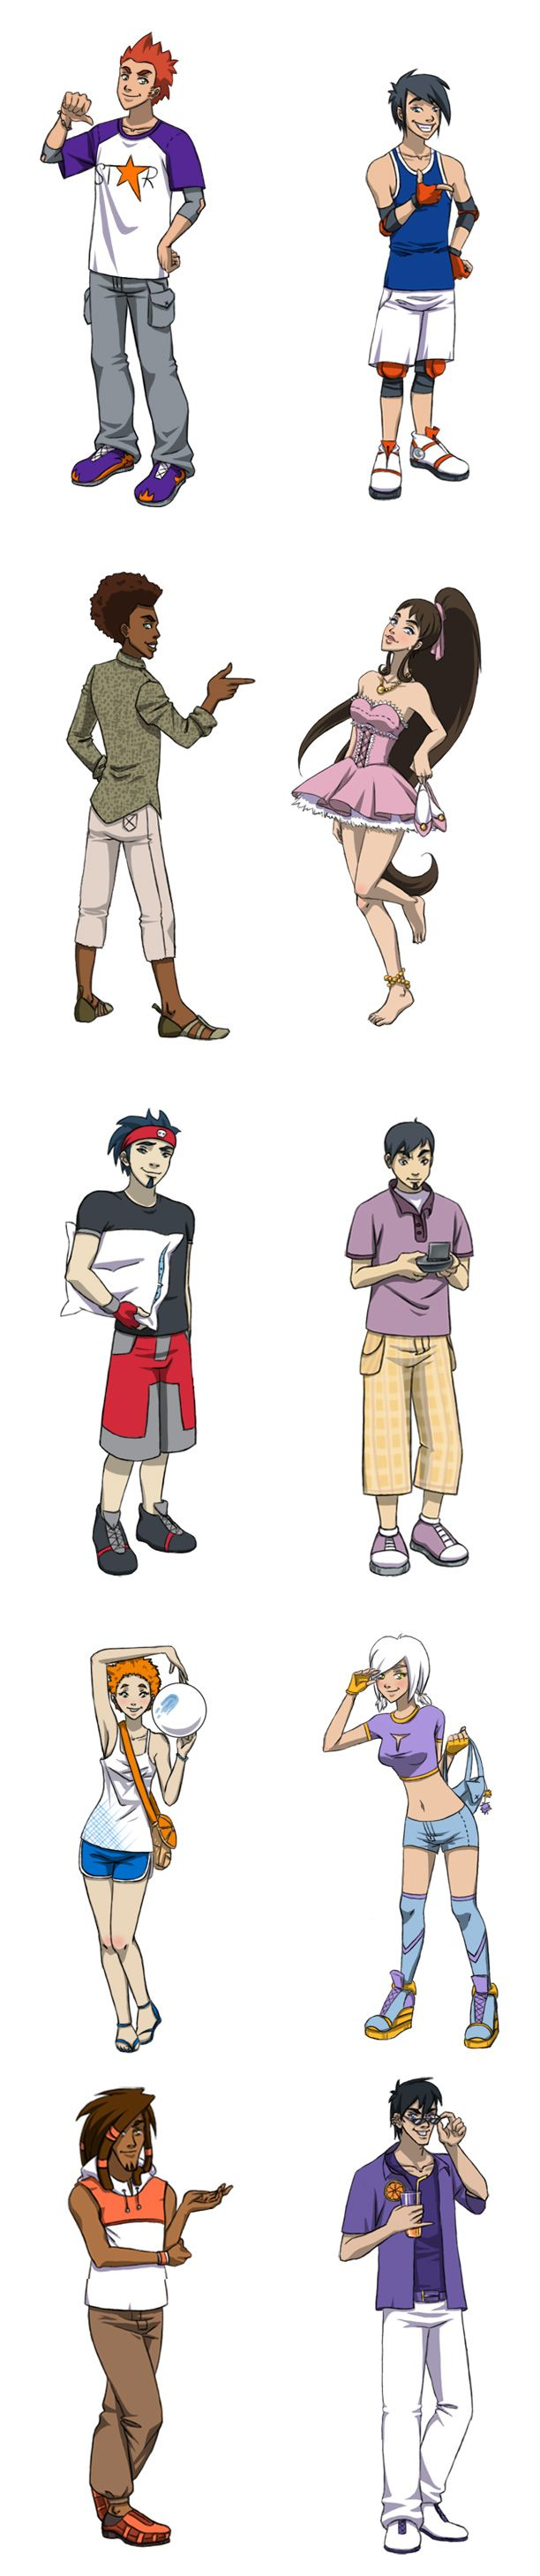 .::GF Characters::. by Marion-Light.deviantart.com on @DeviantArt